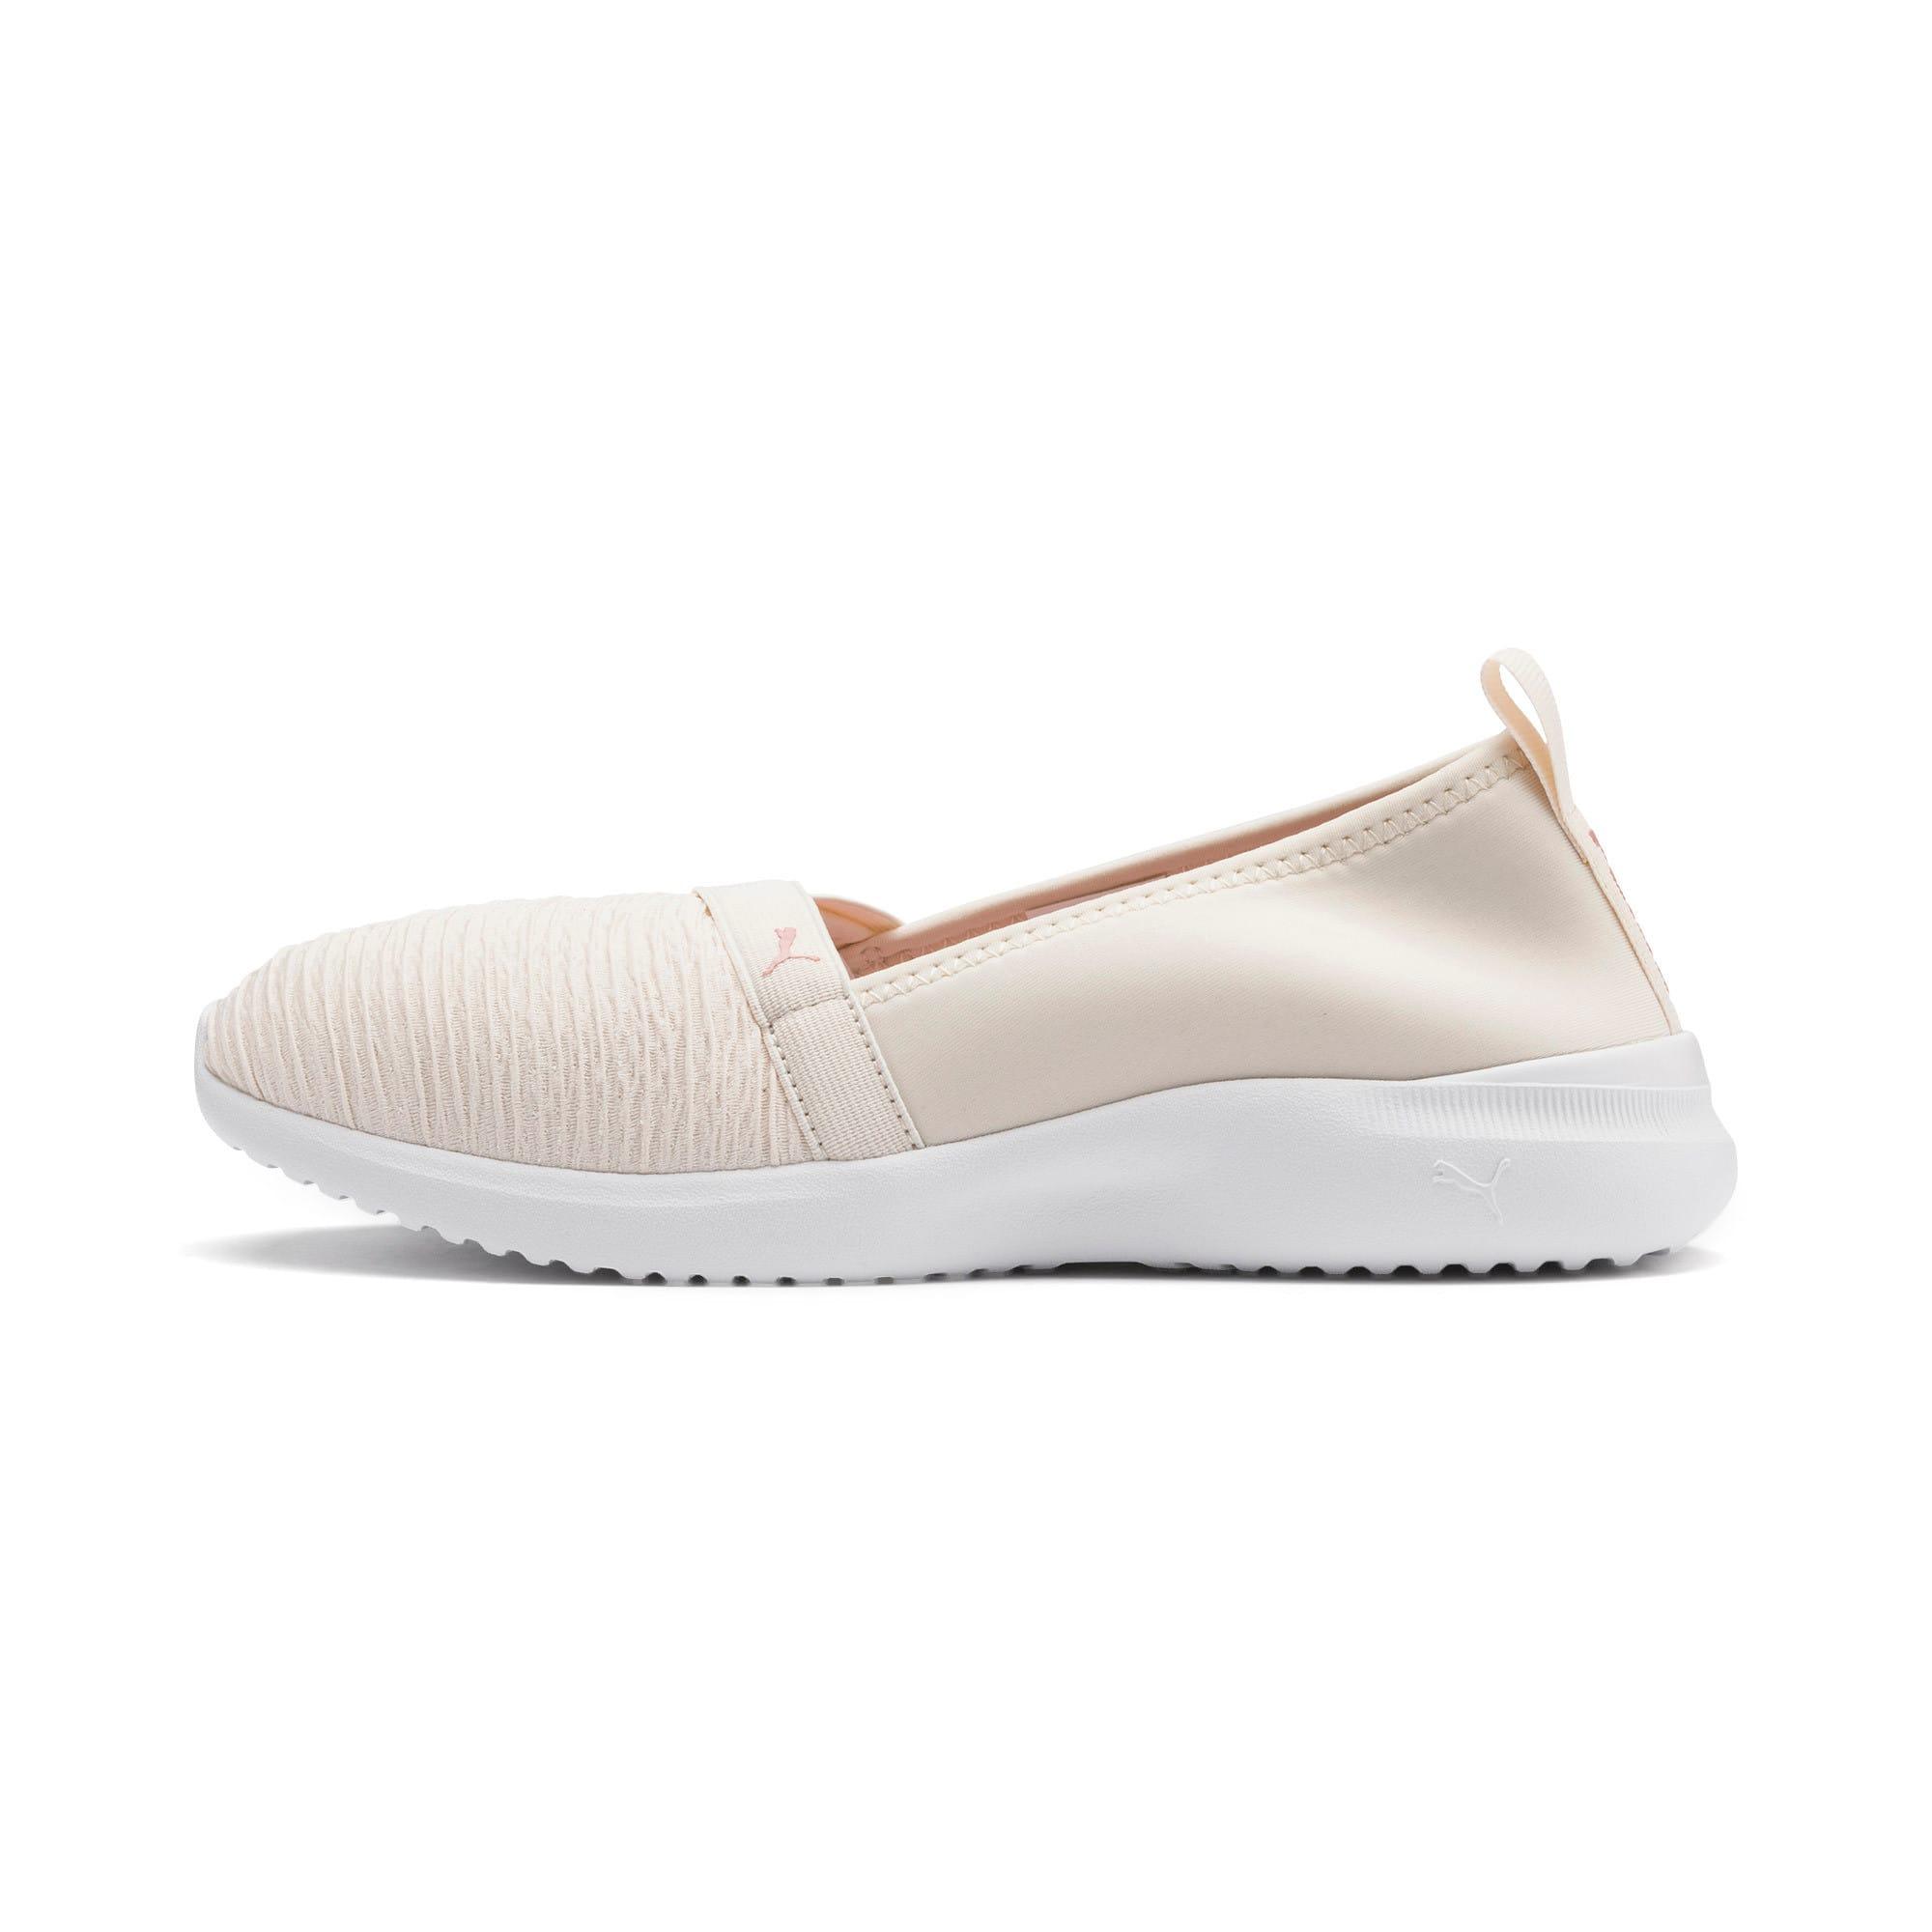 Thumbnail 1 of Adelina Women's Ballet Shoes, Pastel Parchment-B Rose-Wht, medium